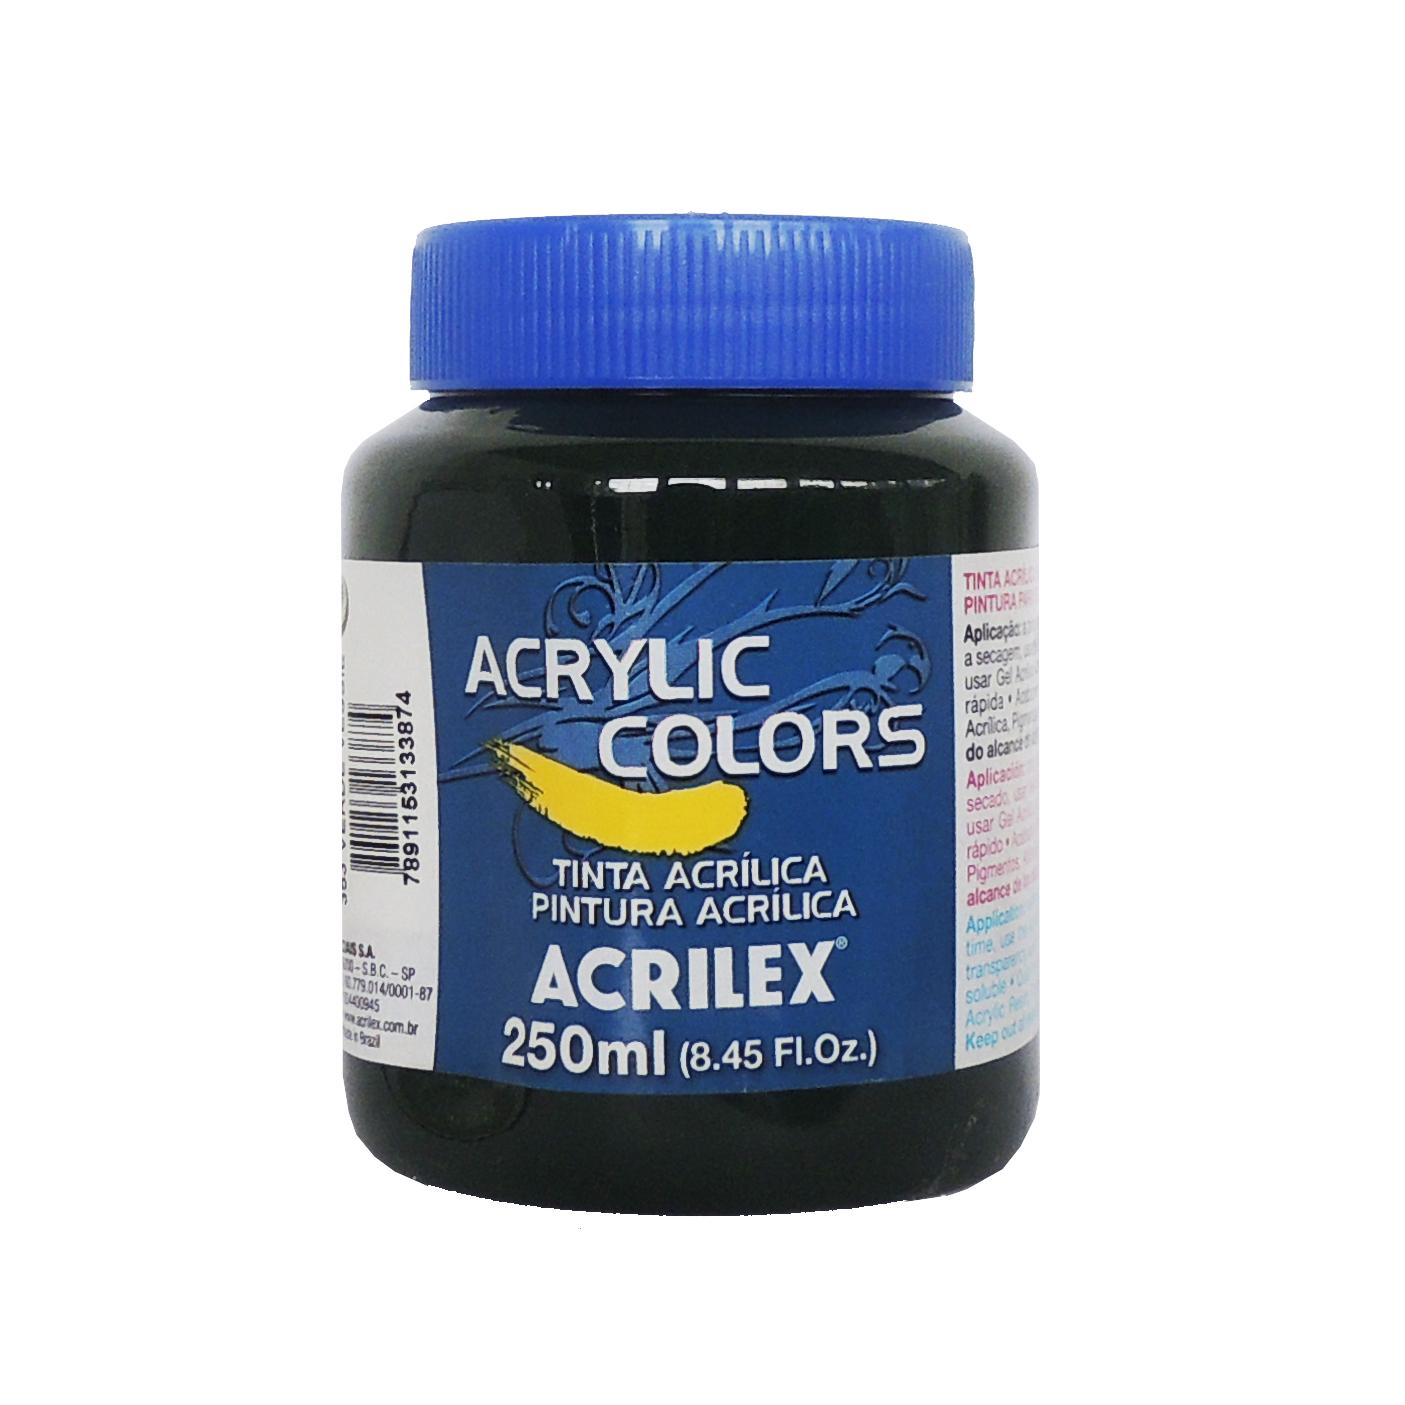 tinta-acrilica-acrilex-250ml-grupo-2-353-verde-vessie